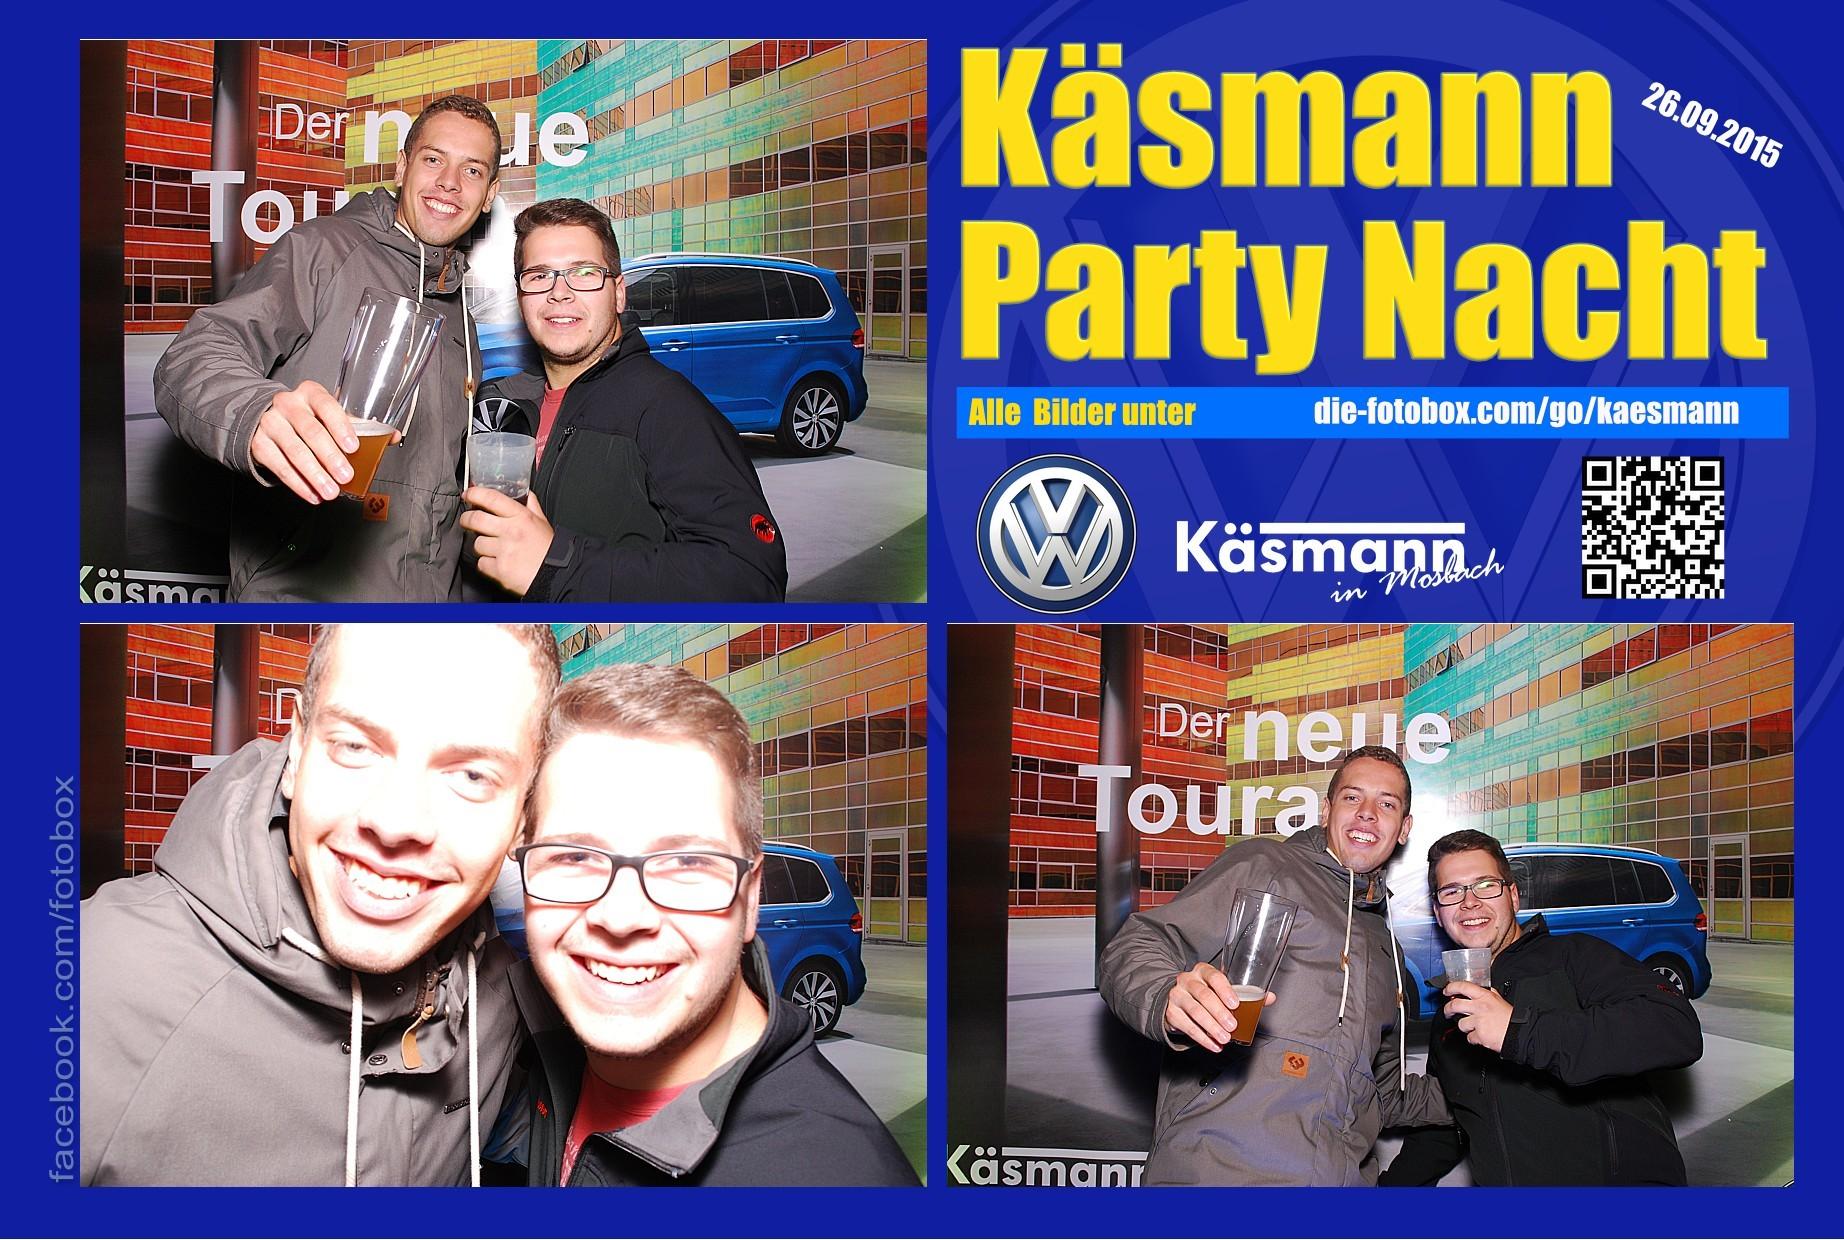 Käsmannparty 2015 - www.die-fotobox.com 01336